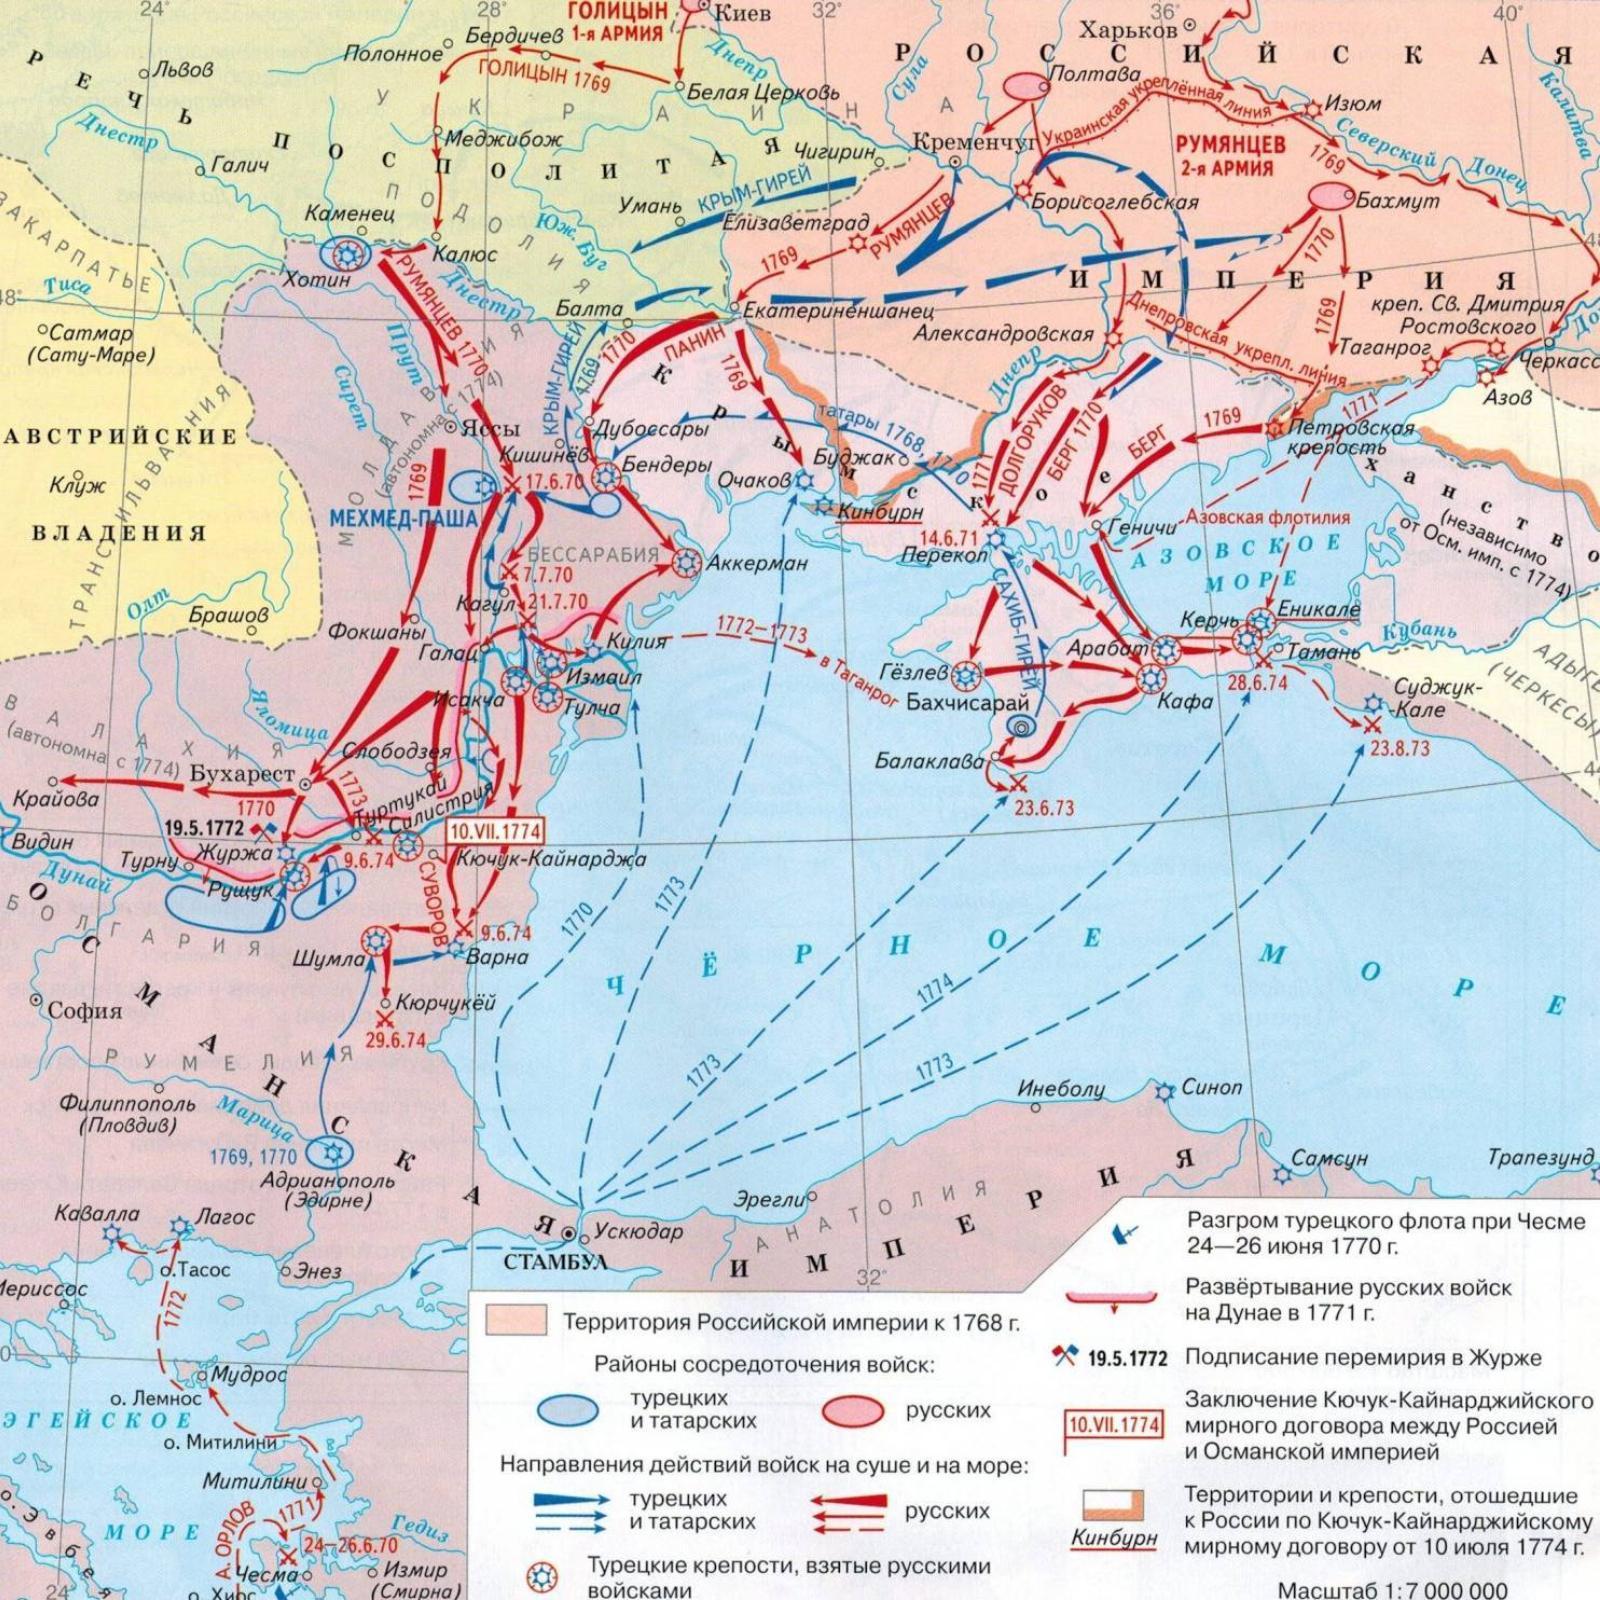 Русско-турецкая война.